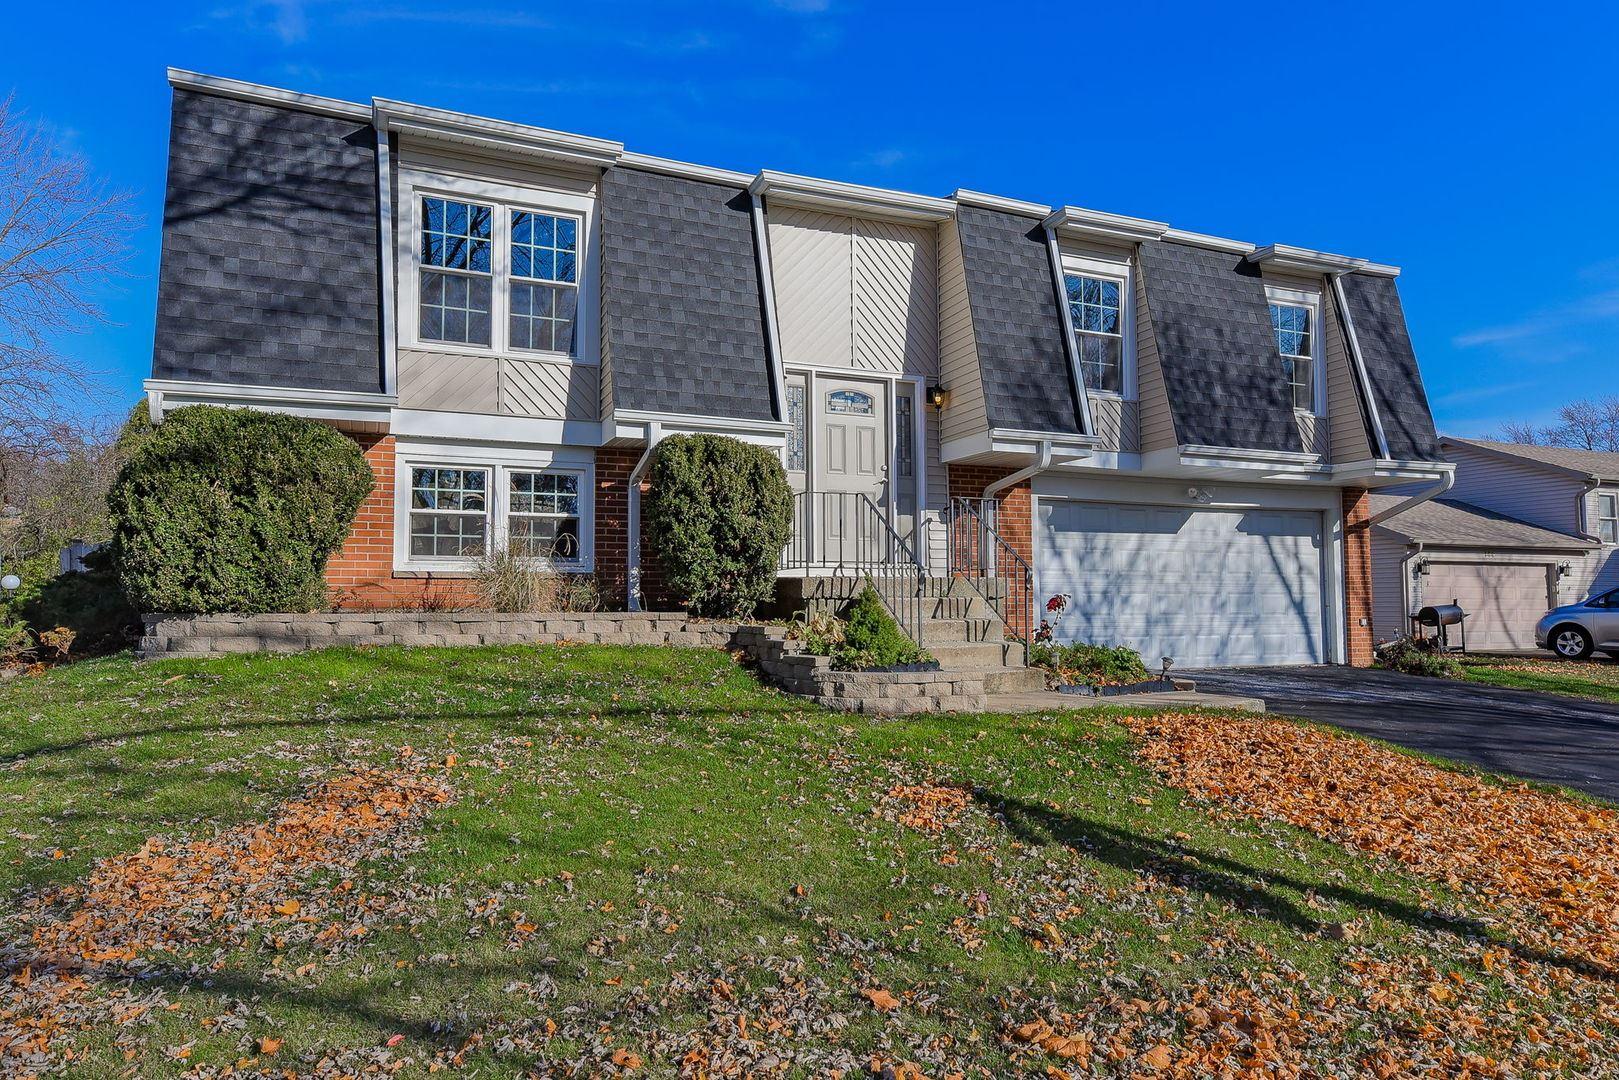 Photo of 185 Farm Gate Lane, Bolingbrook, IL 60490 (MLS # 10929056)